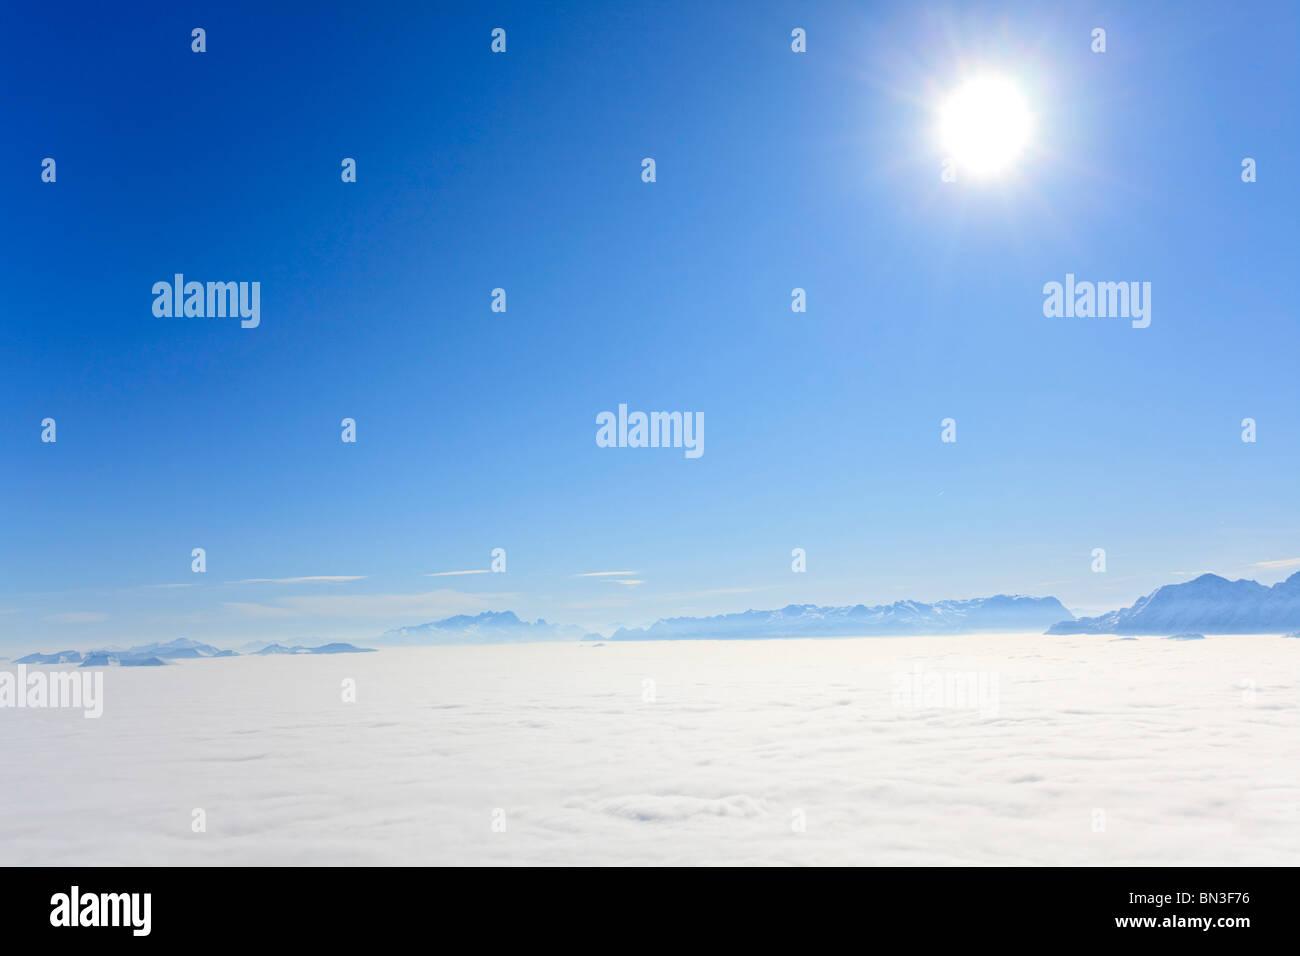 Cubriendo la niebla Salzachtal, Salzburger Land, Austria Imagen De Stock